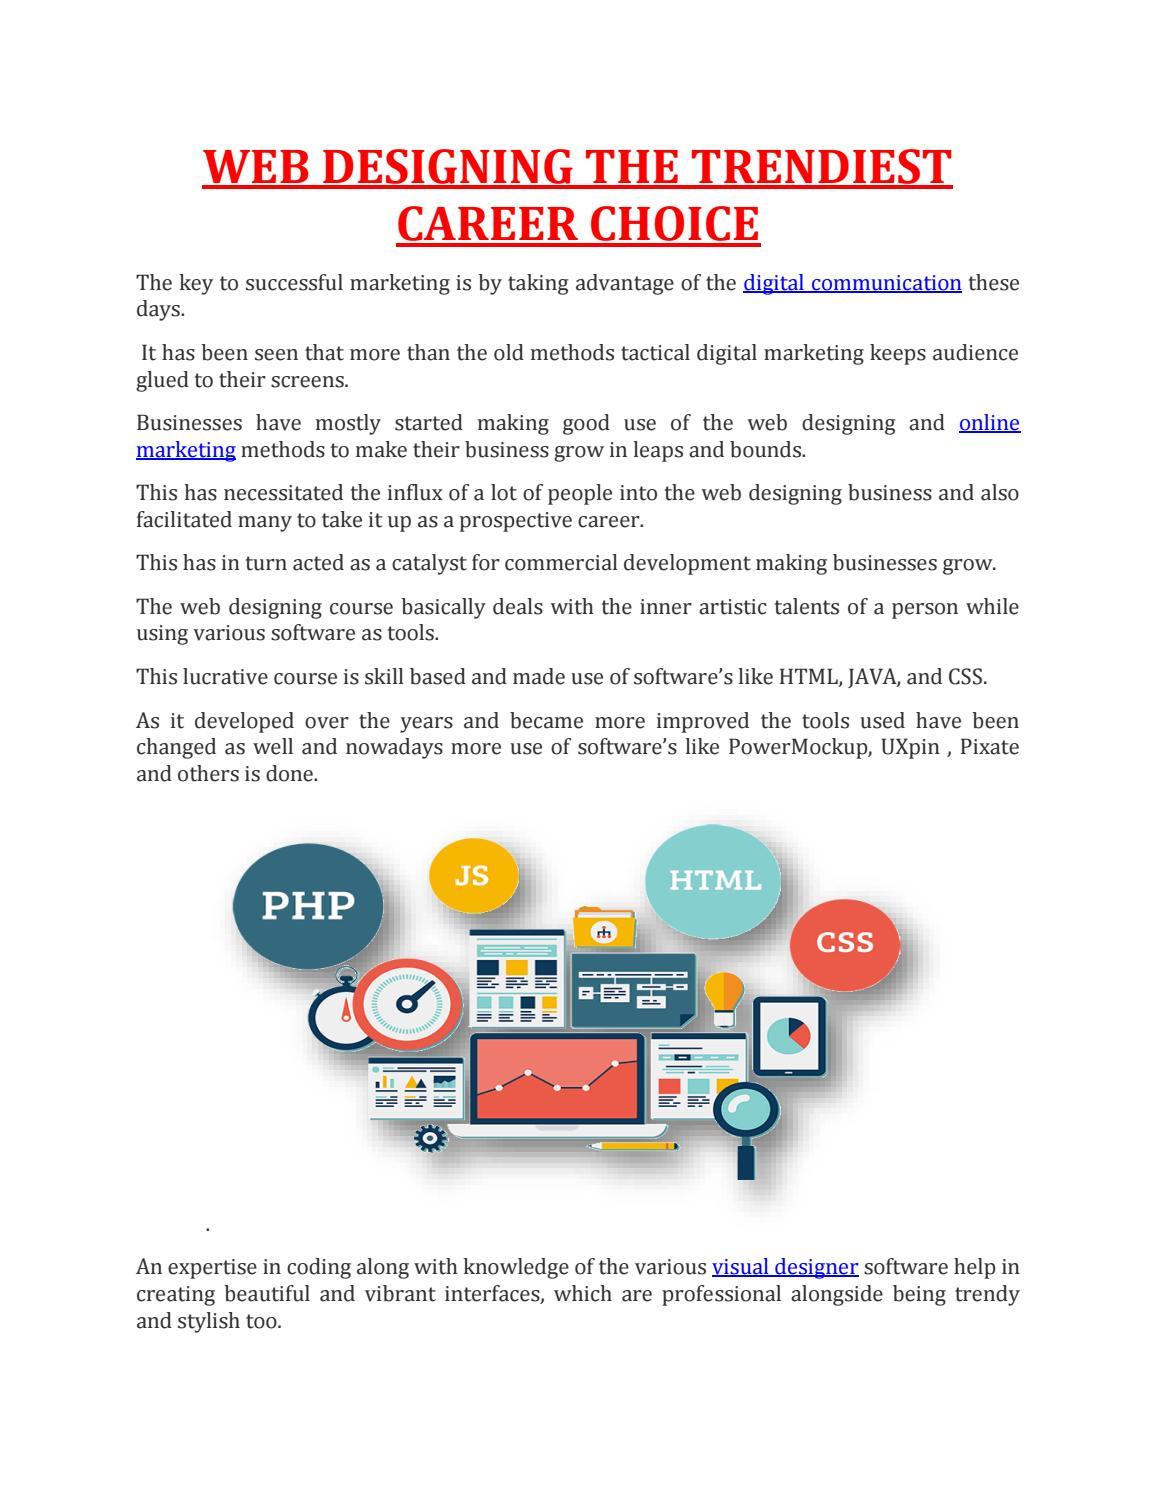 Web Designing The Trendiest Career Choice By Maac Animation Kolkata Issuu